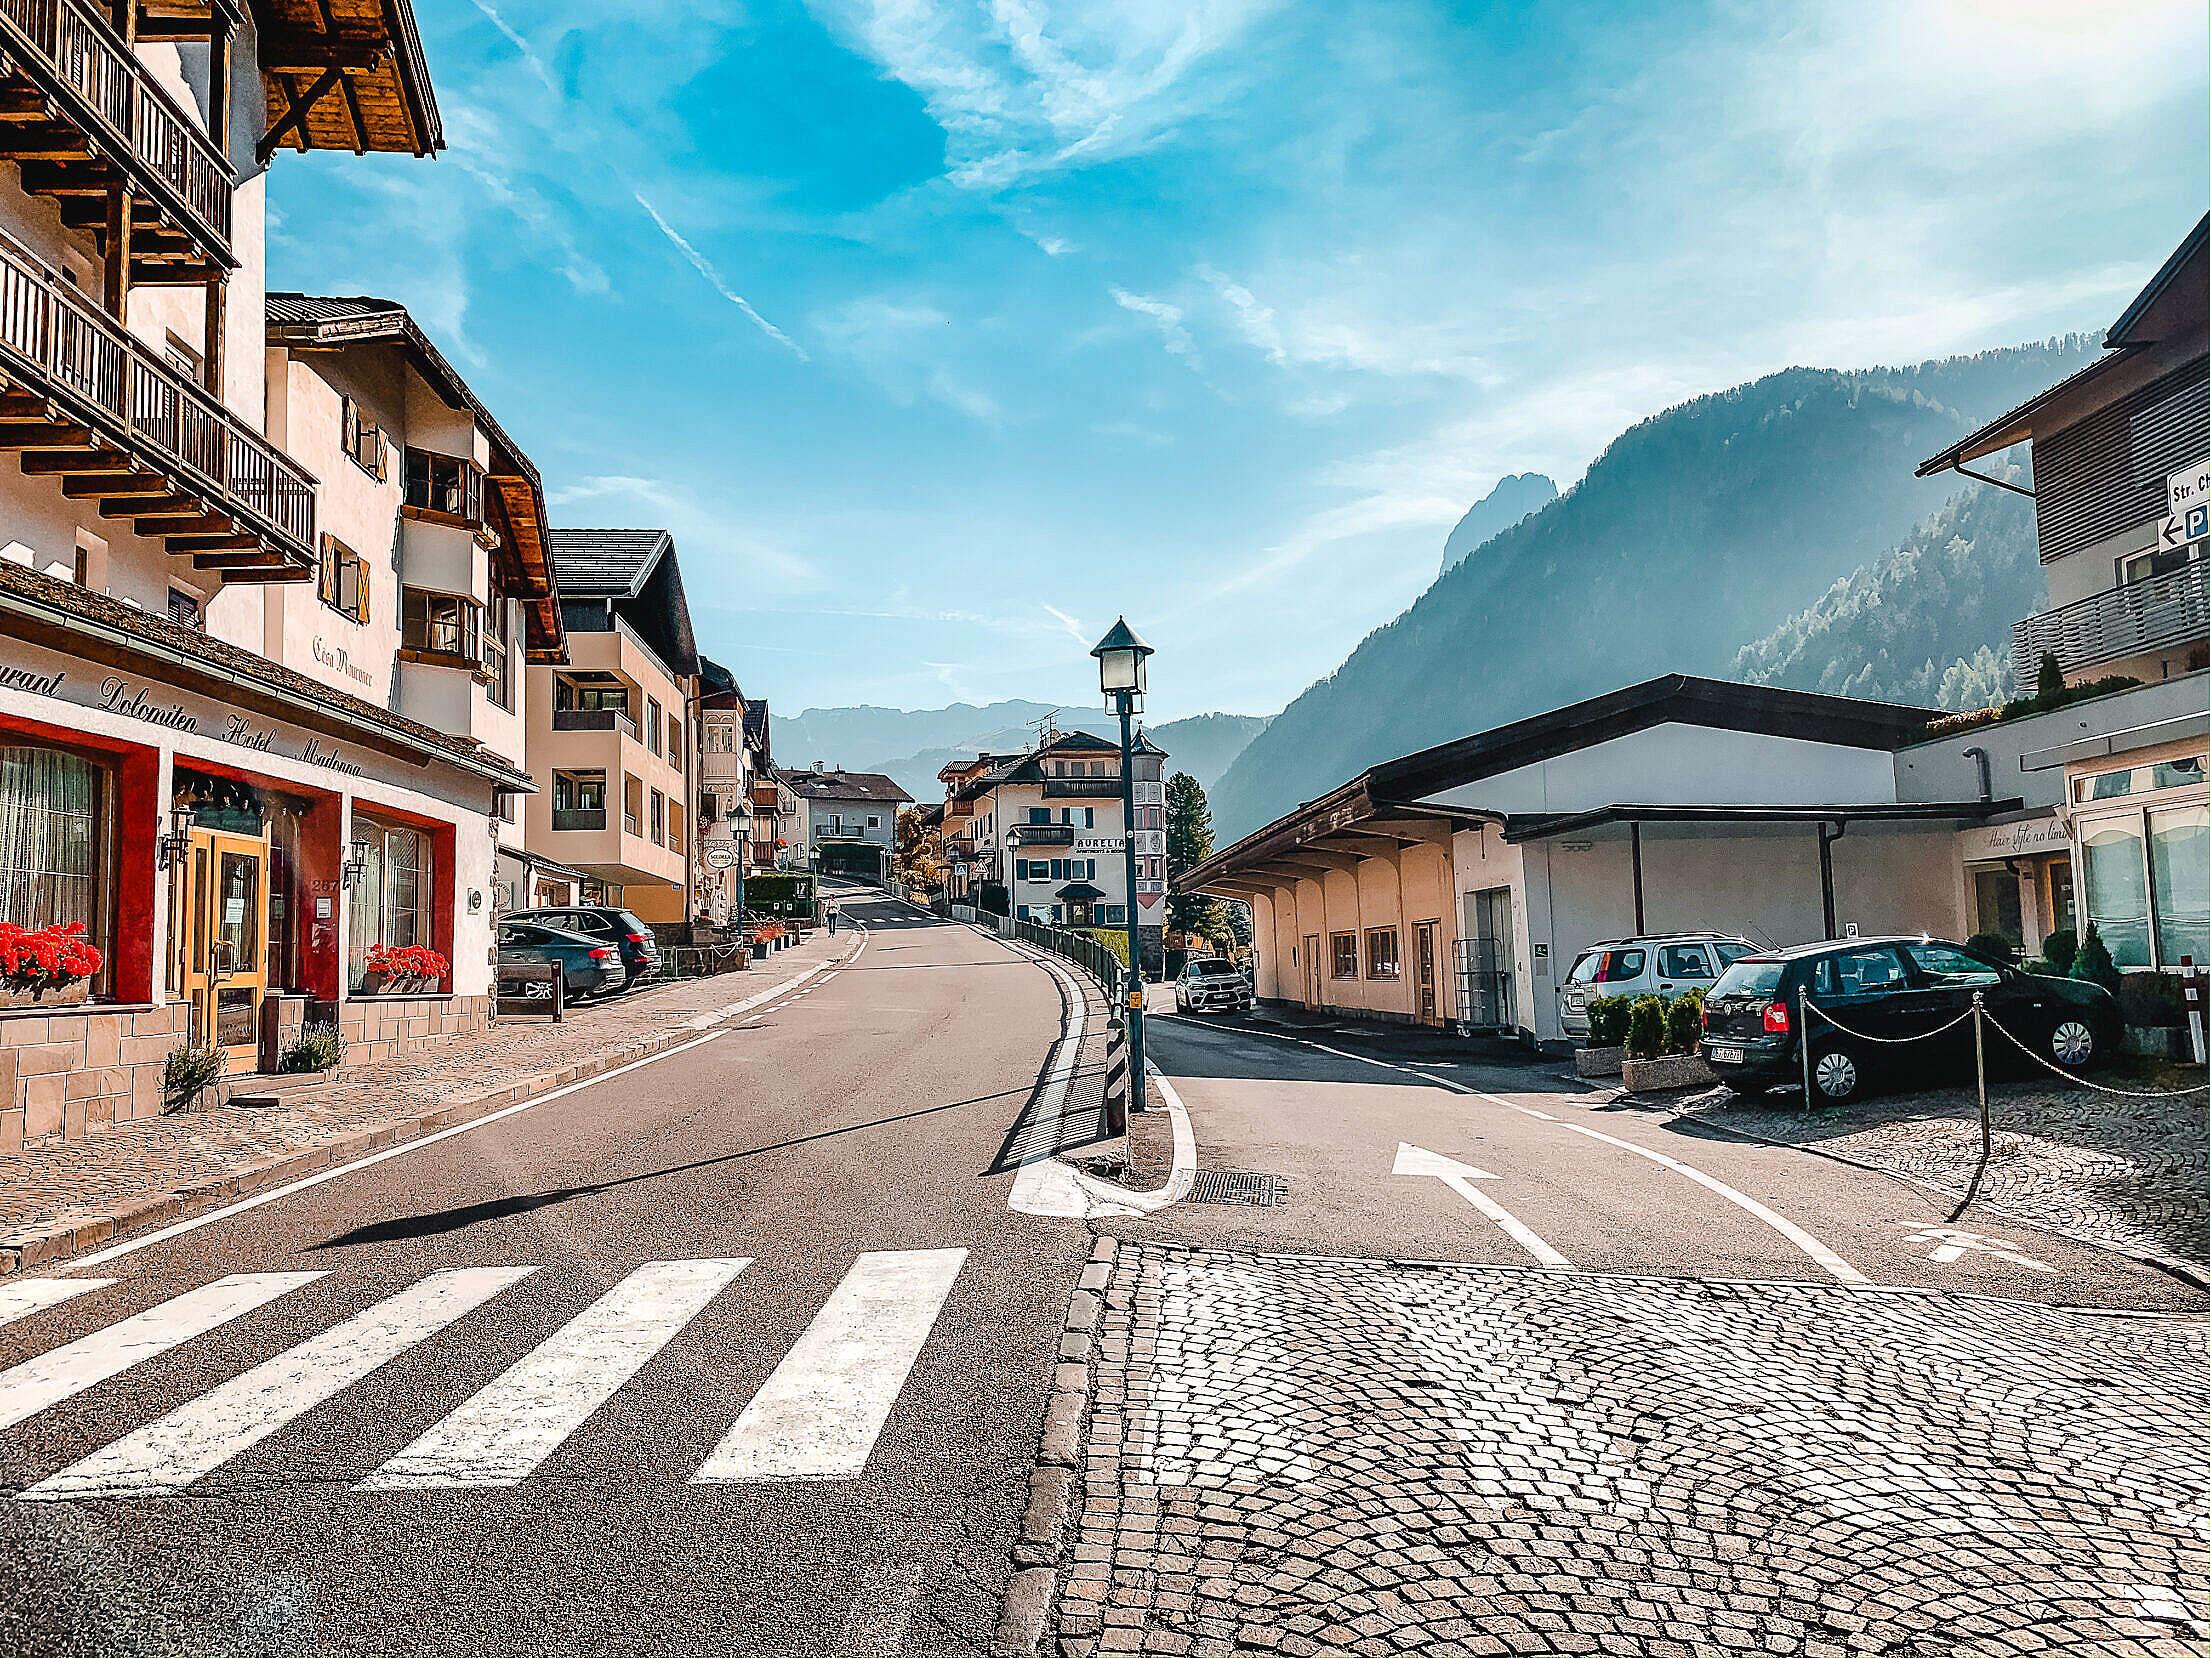 Dolomiti Villages in Italy Free Stock Photo